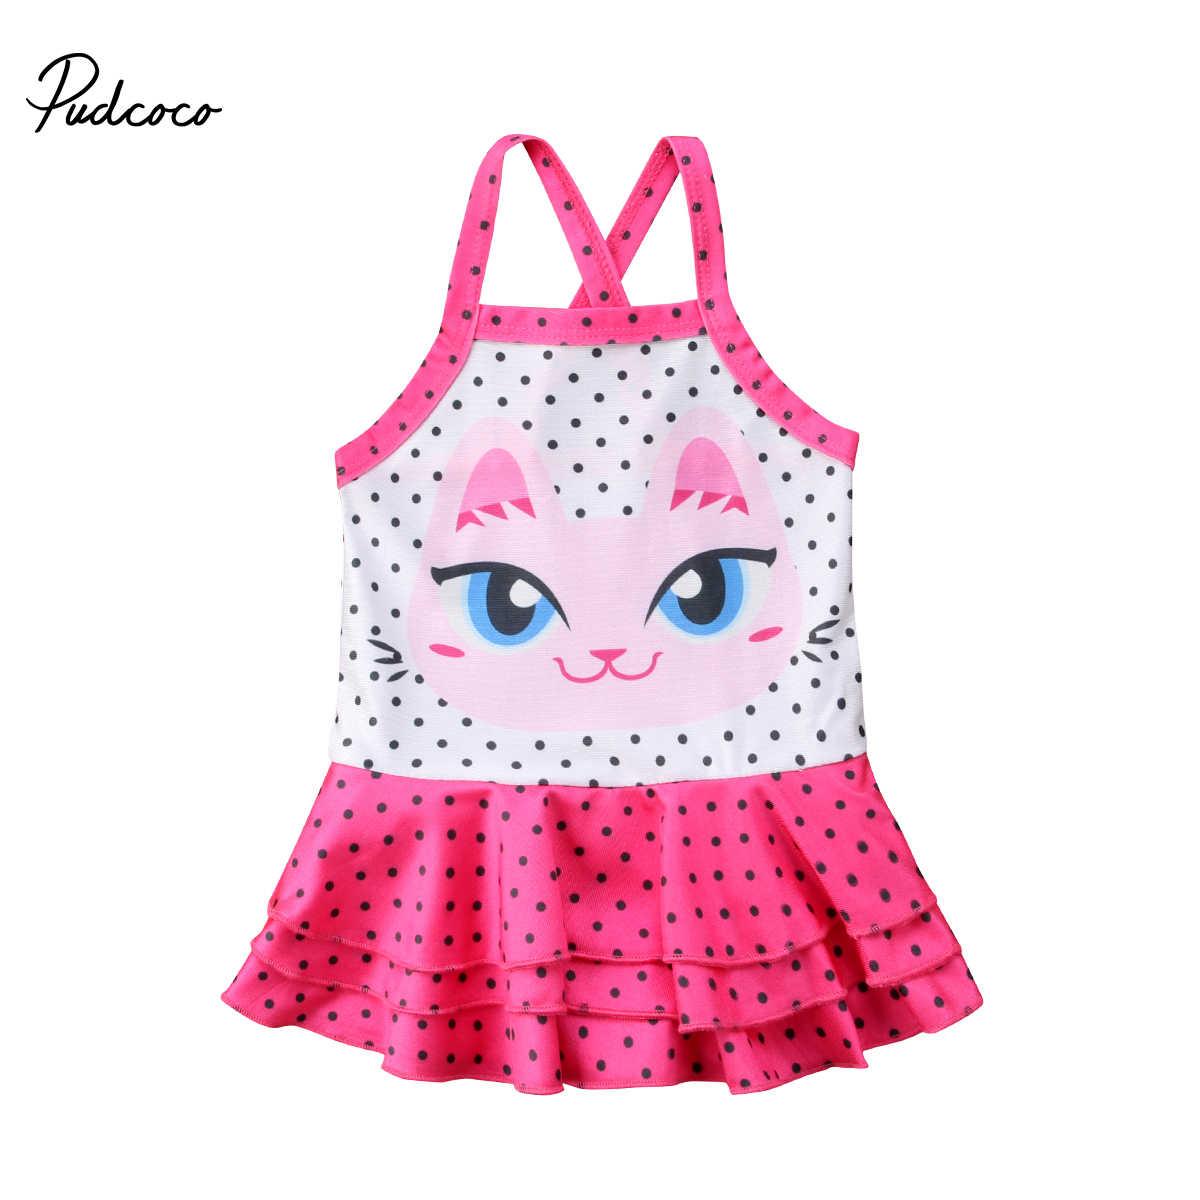 ea551243c037 ... 2018 Lovely Swimwear Toddler Baby Girl Tankini Polka Dots Bikini  Sleeveless Swimwear Swimsuit Bathing Toddler Girls ...